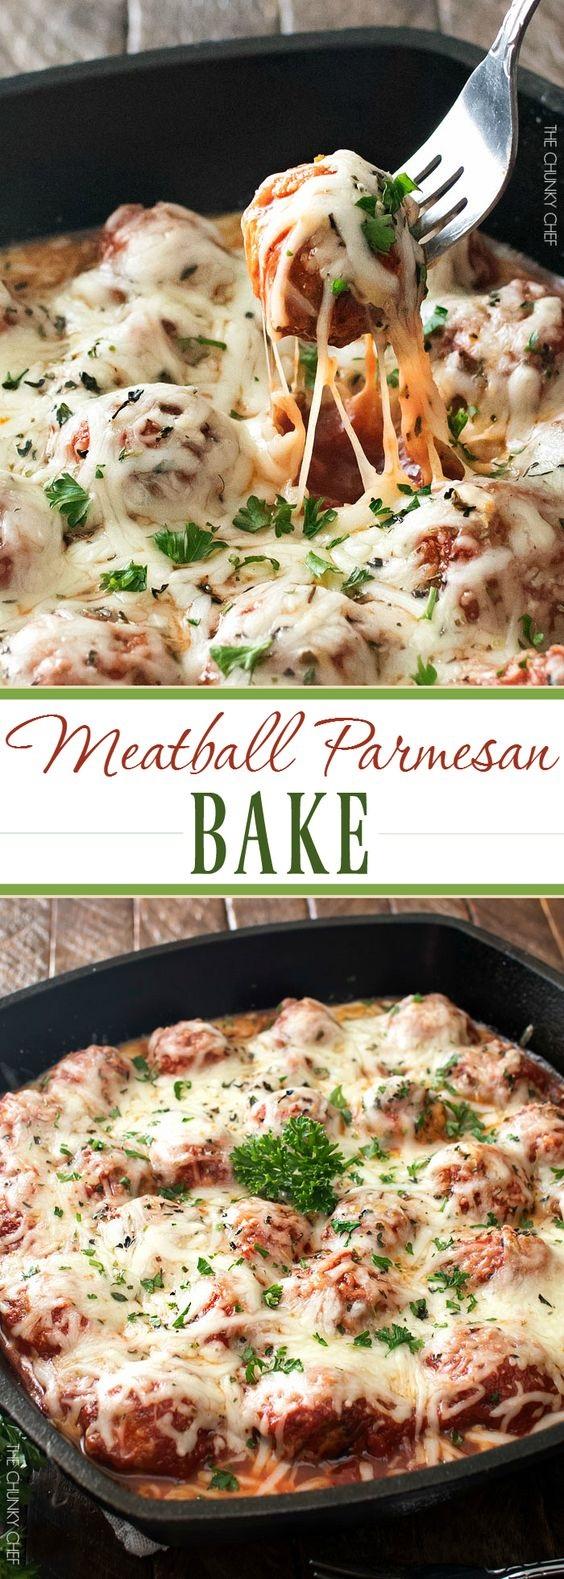 Meatball Parmesan Bake